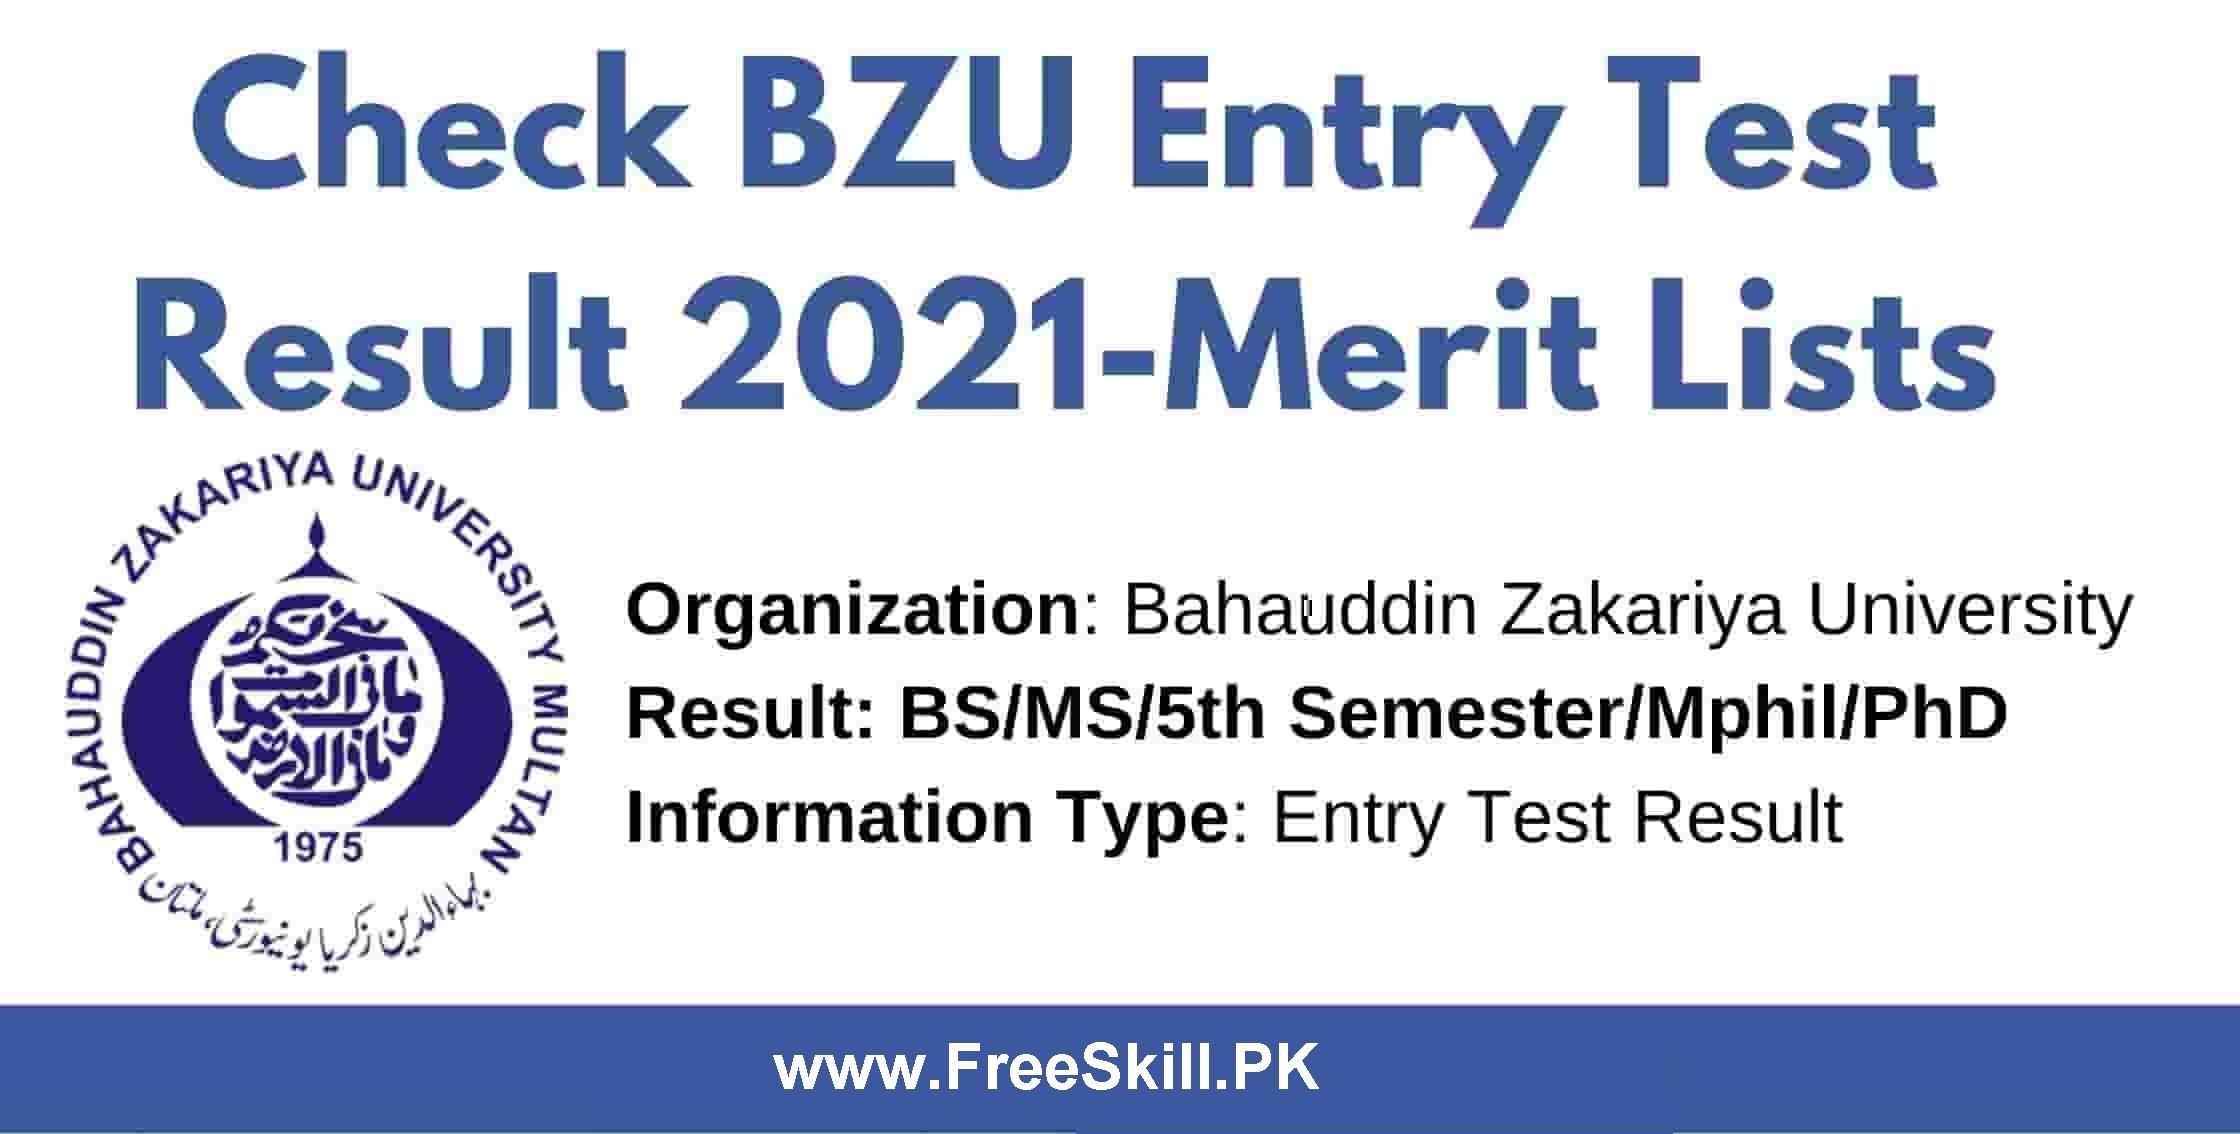 BZU Entry Test Result